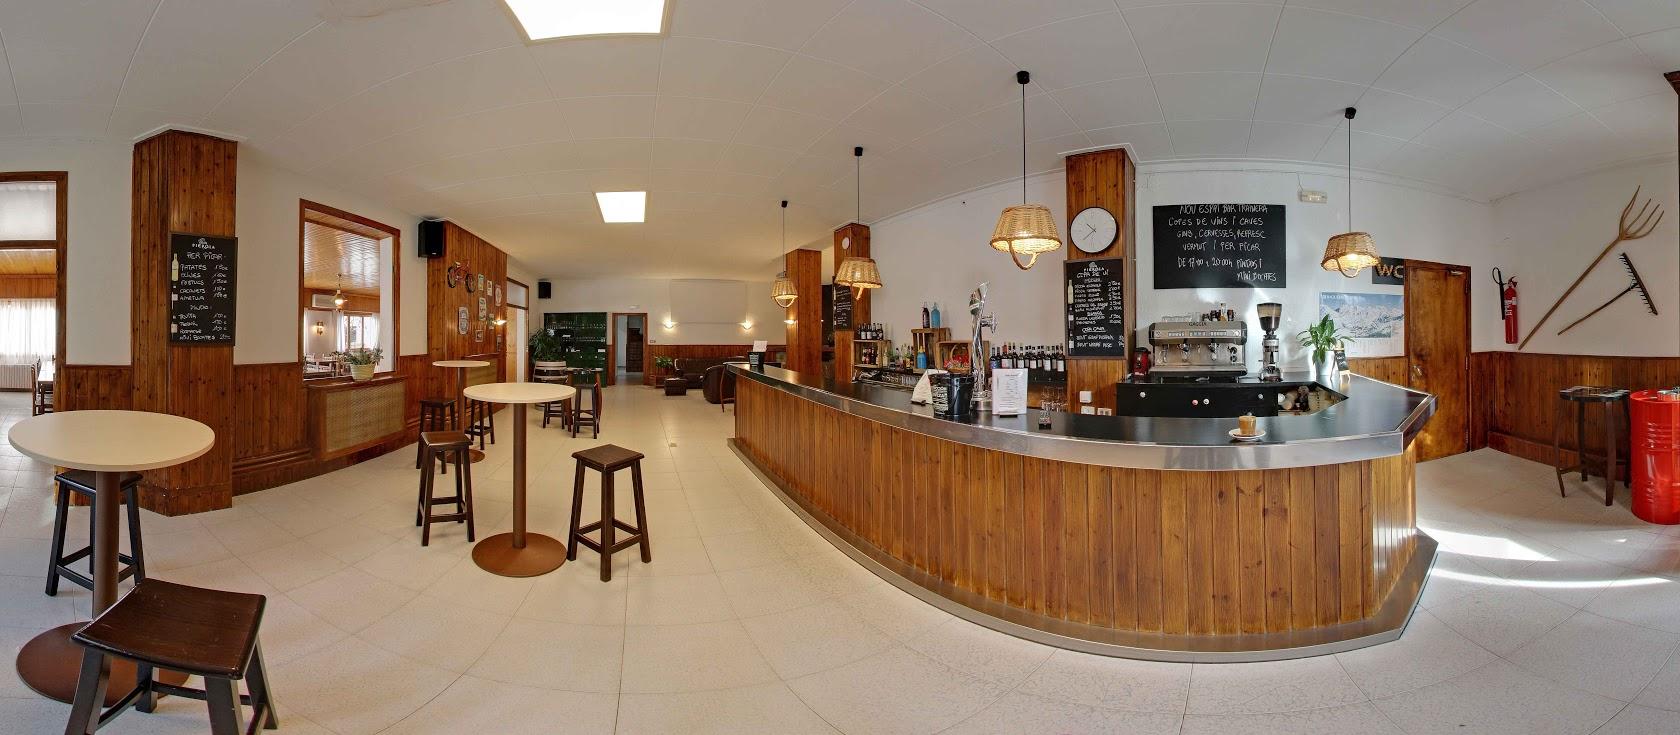 Bar and café